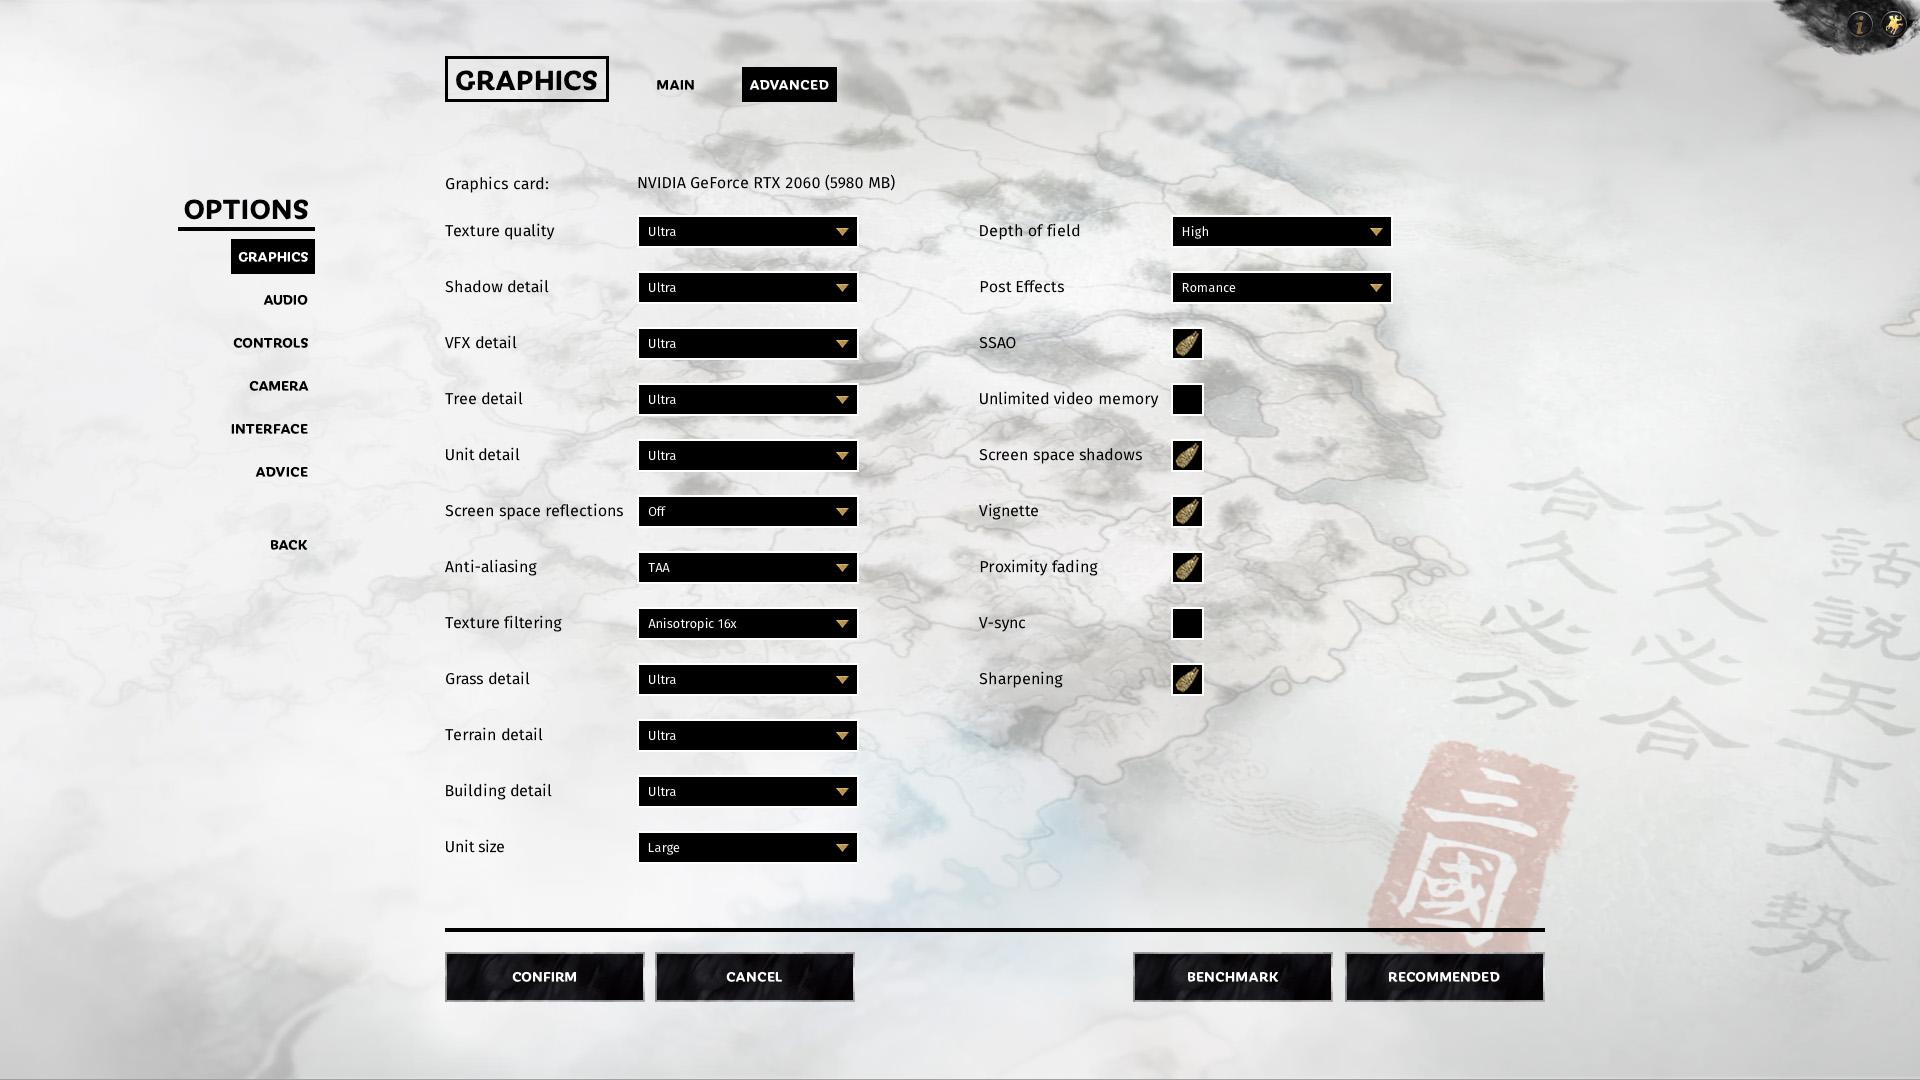 NVIDIA's GeForce RTX 2080 SUPER At 1080p, 1440p & Ultrawide